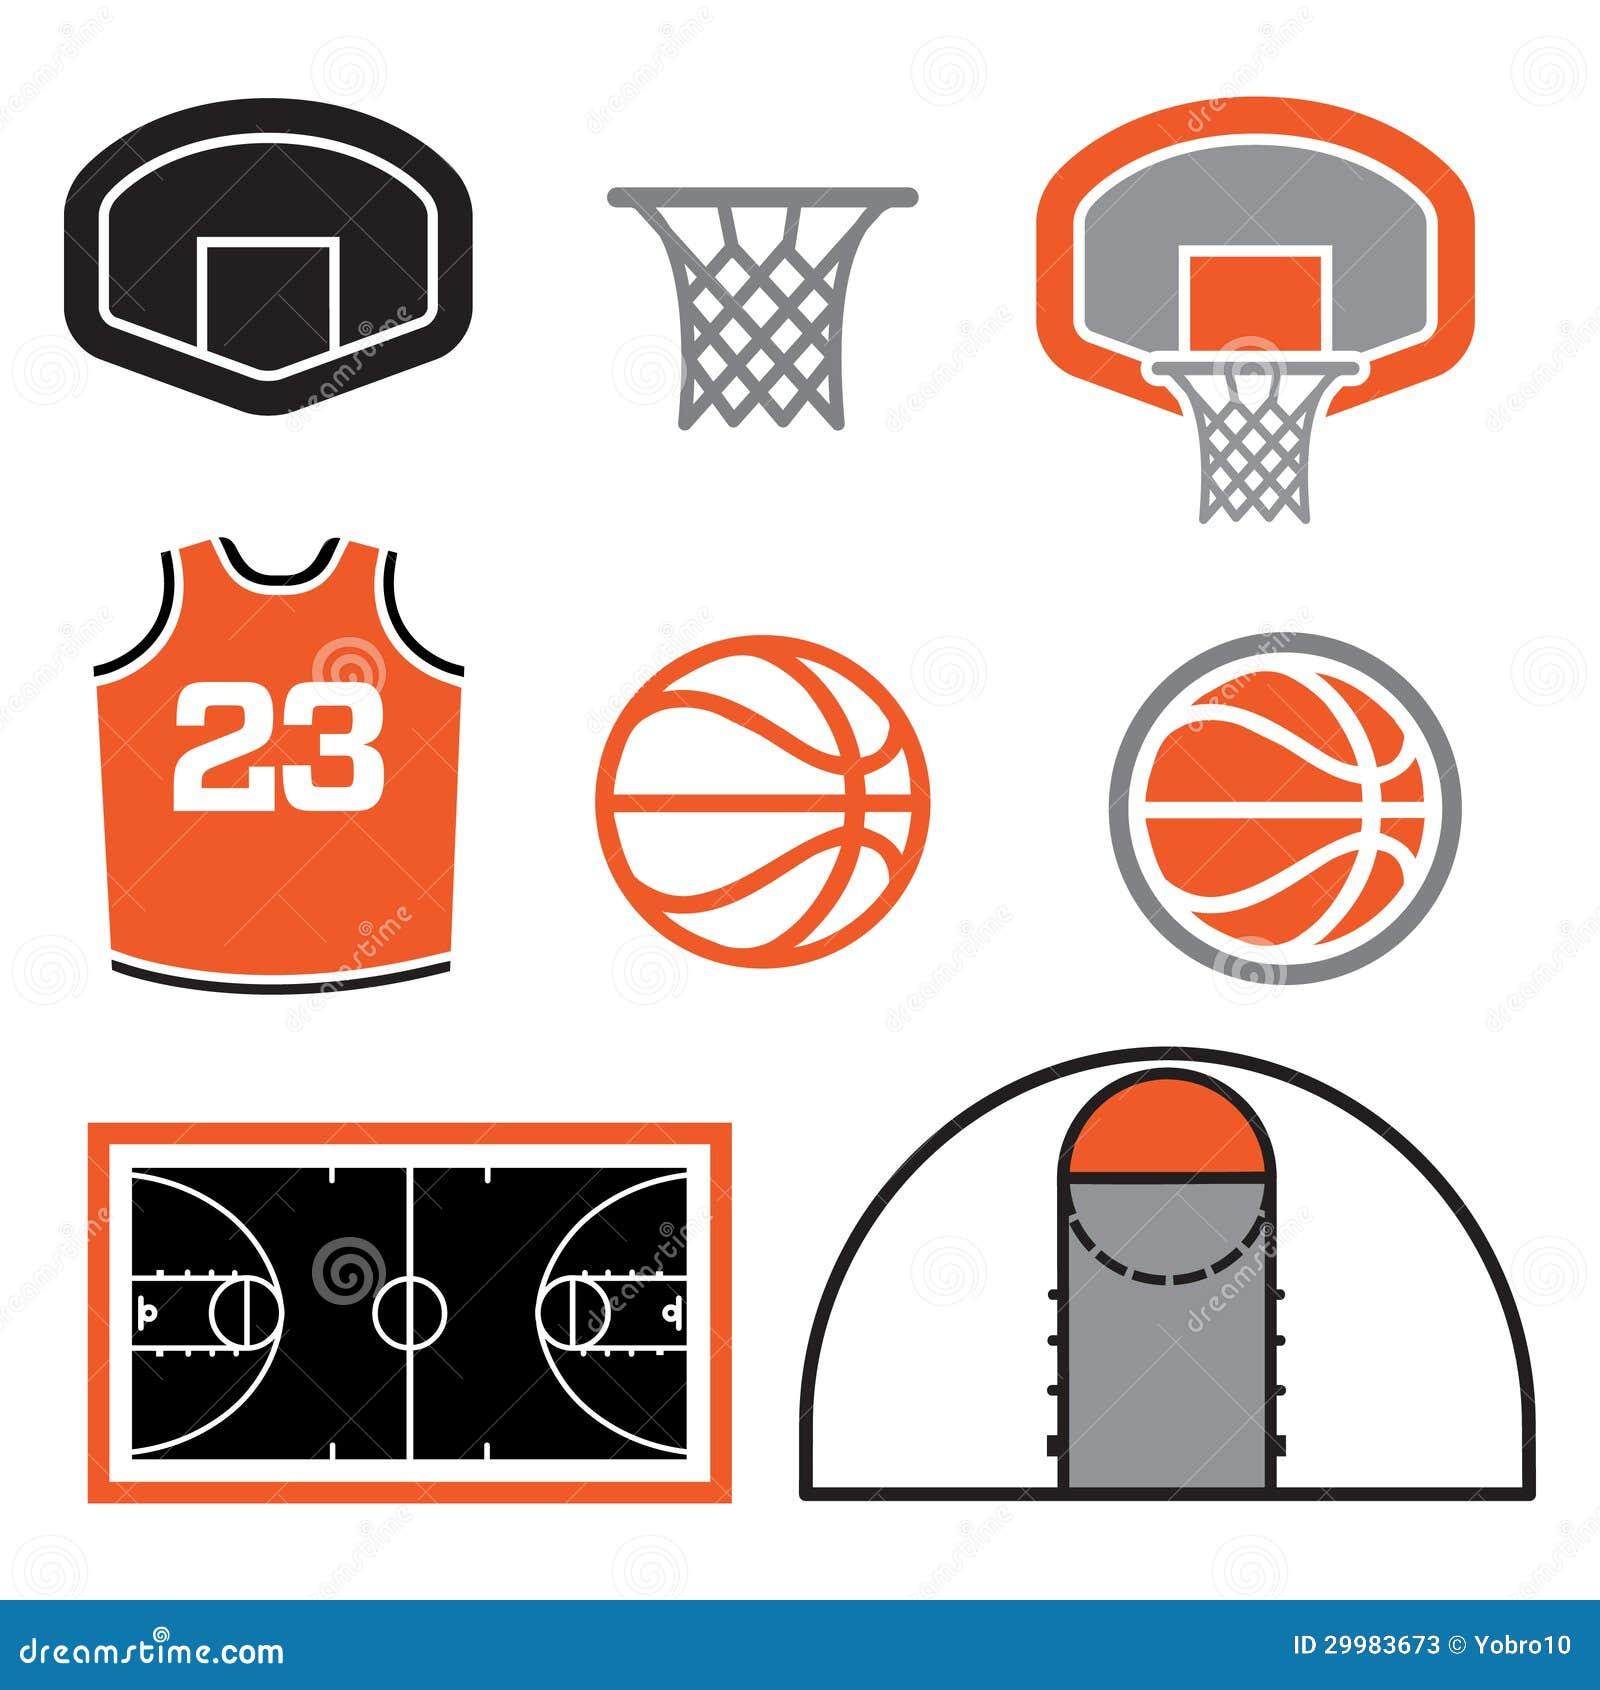 Basketball Elements Illustration Stock Vector Illustration Of